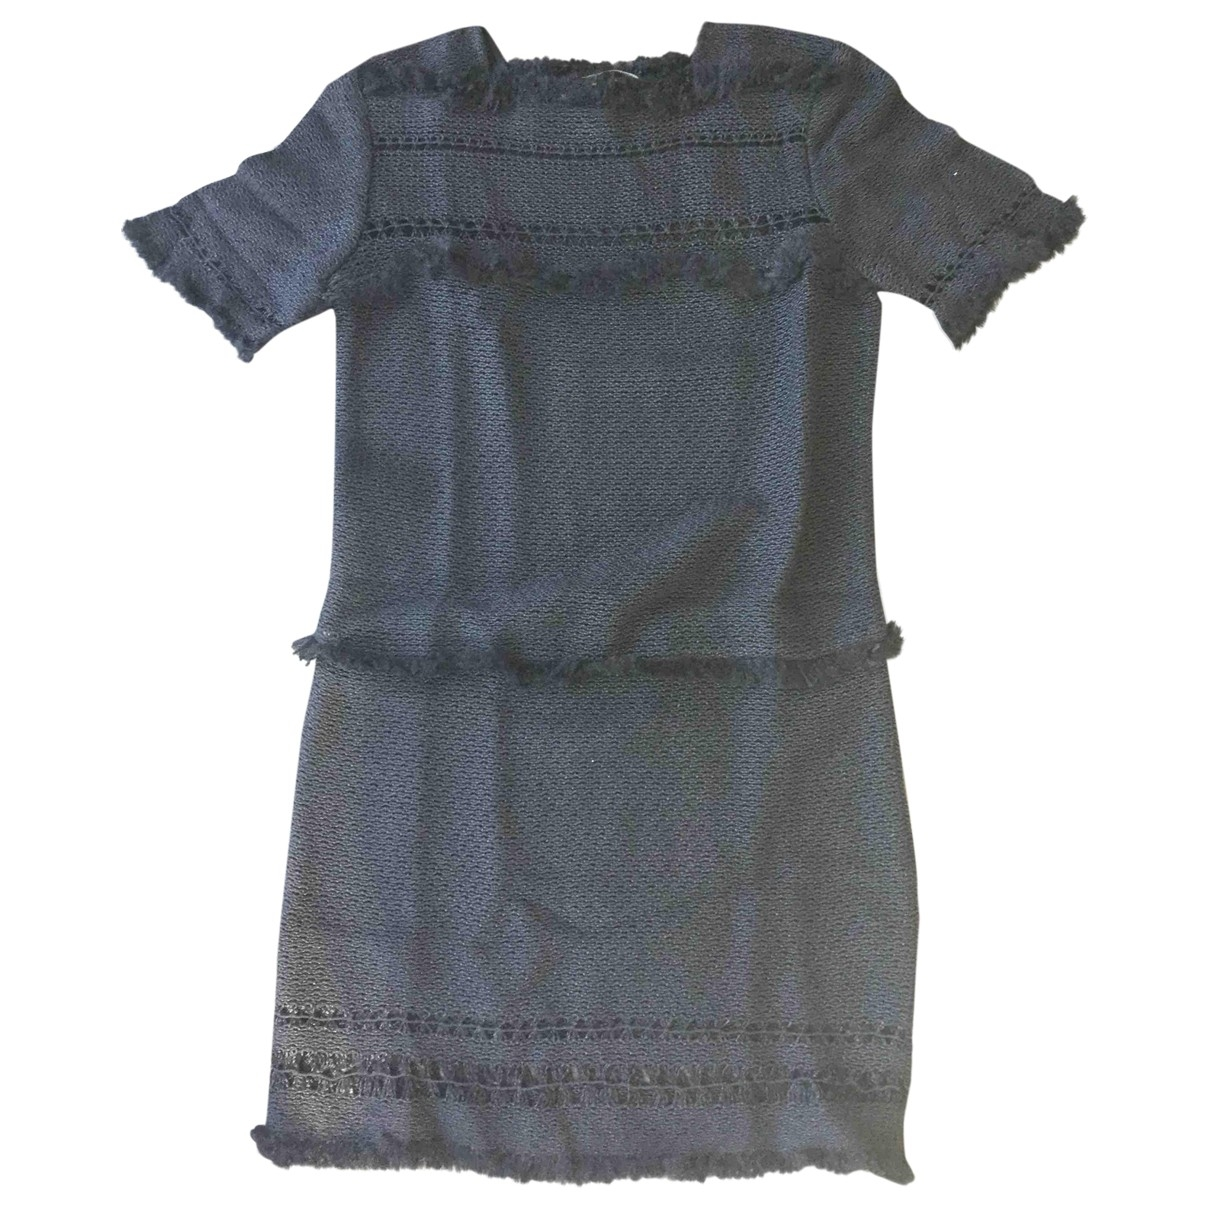 Isabel Marant \N Black Cotton - elasthane dress for Women 34 FR